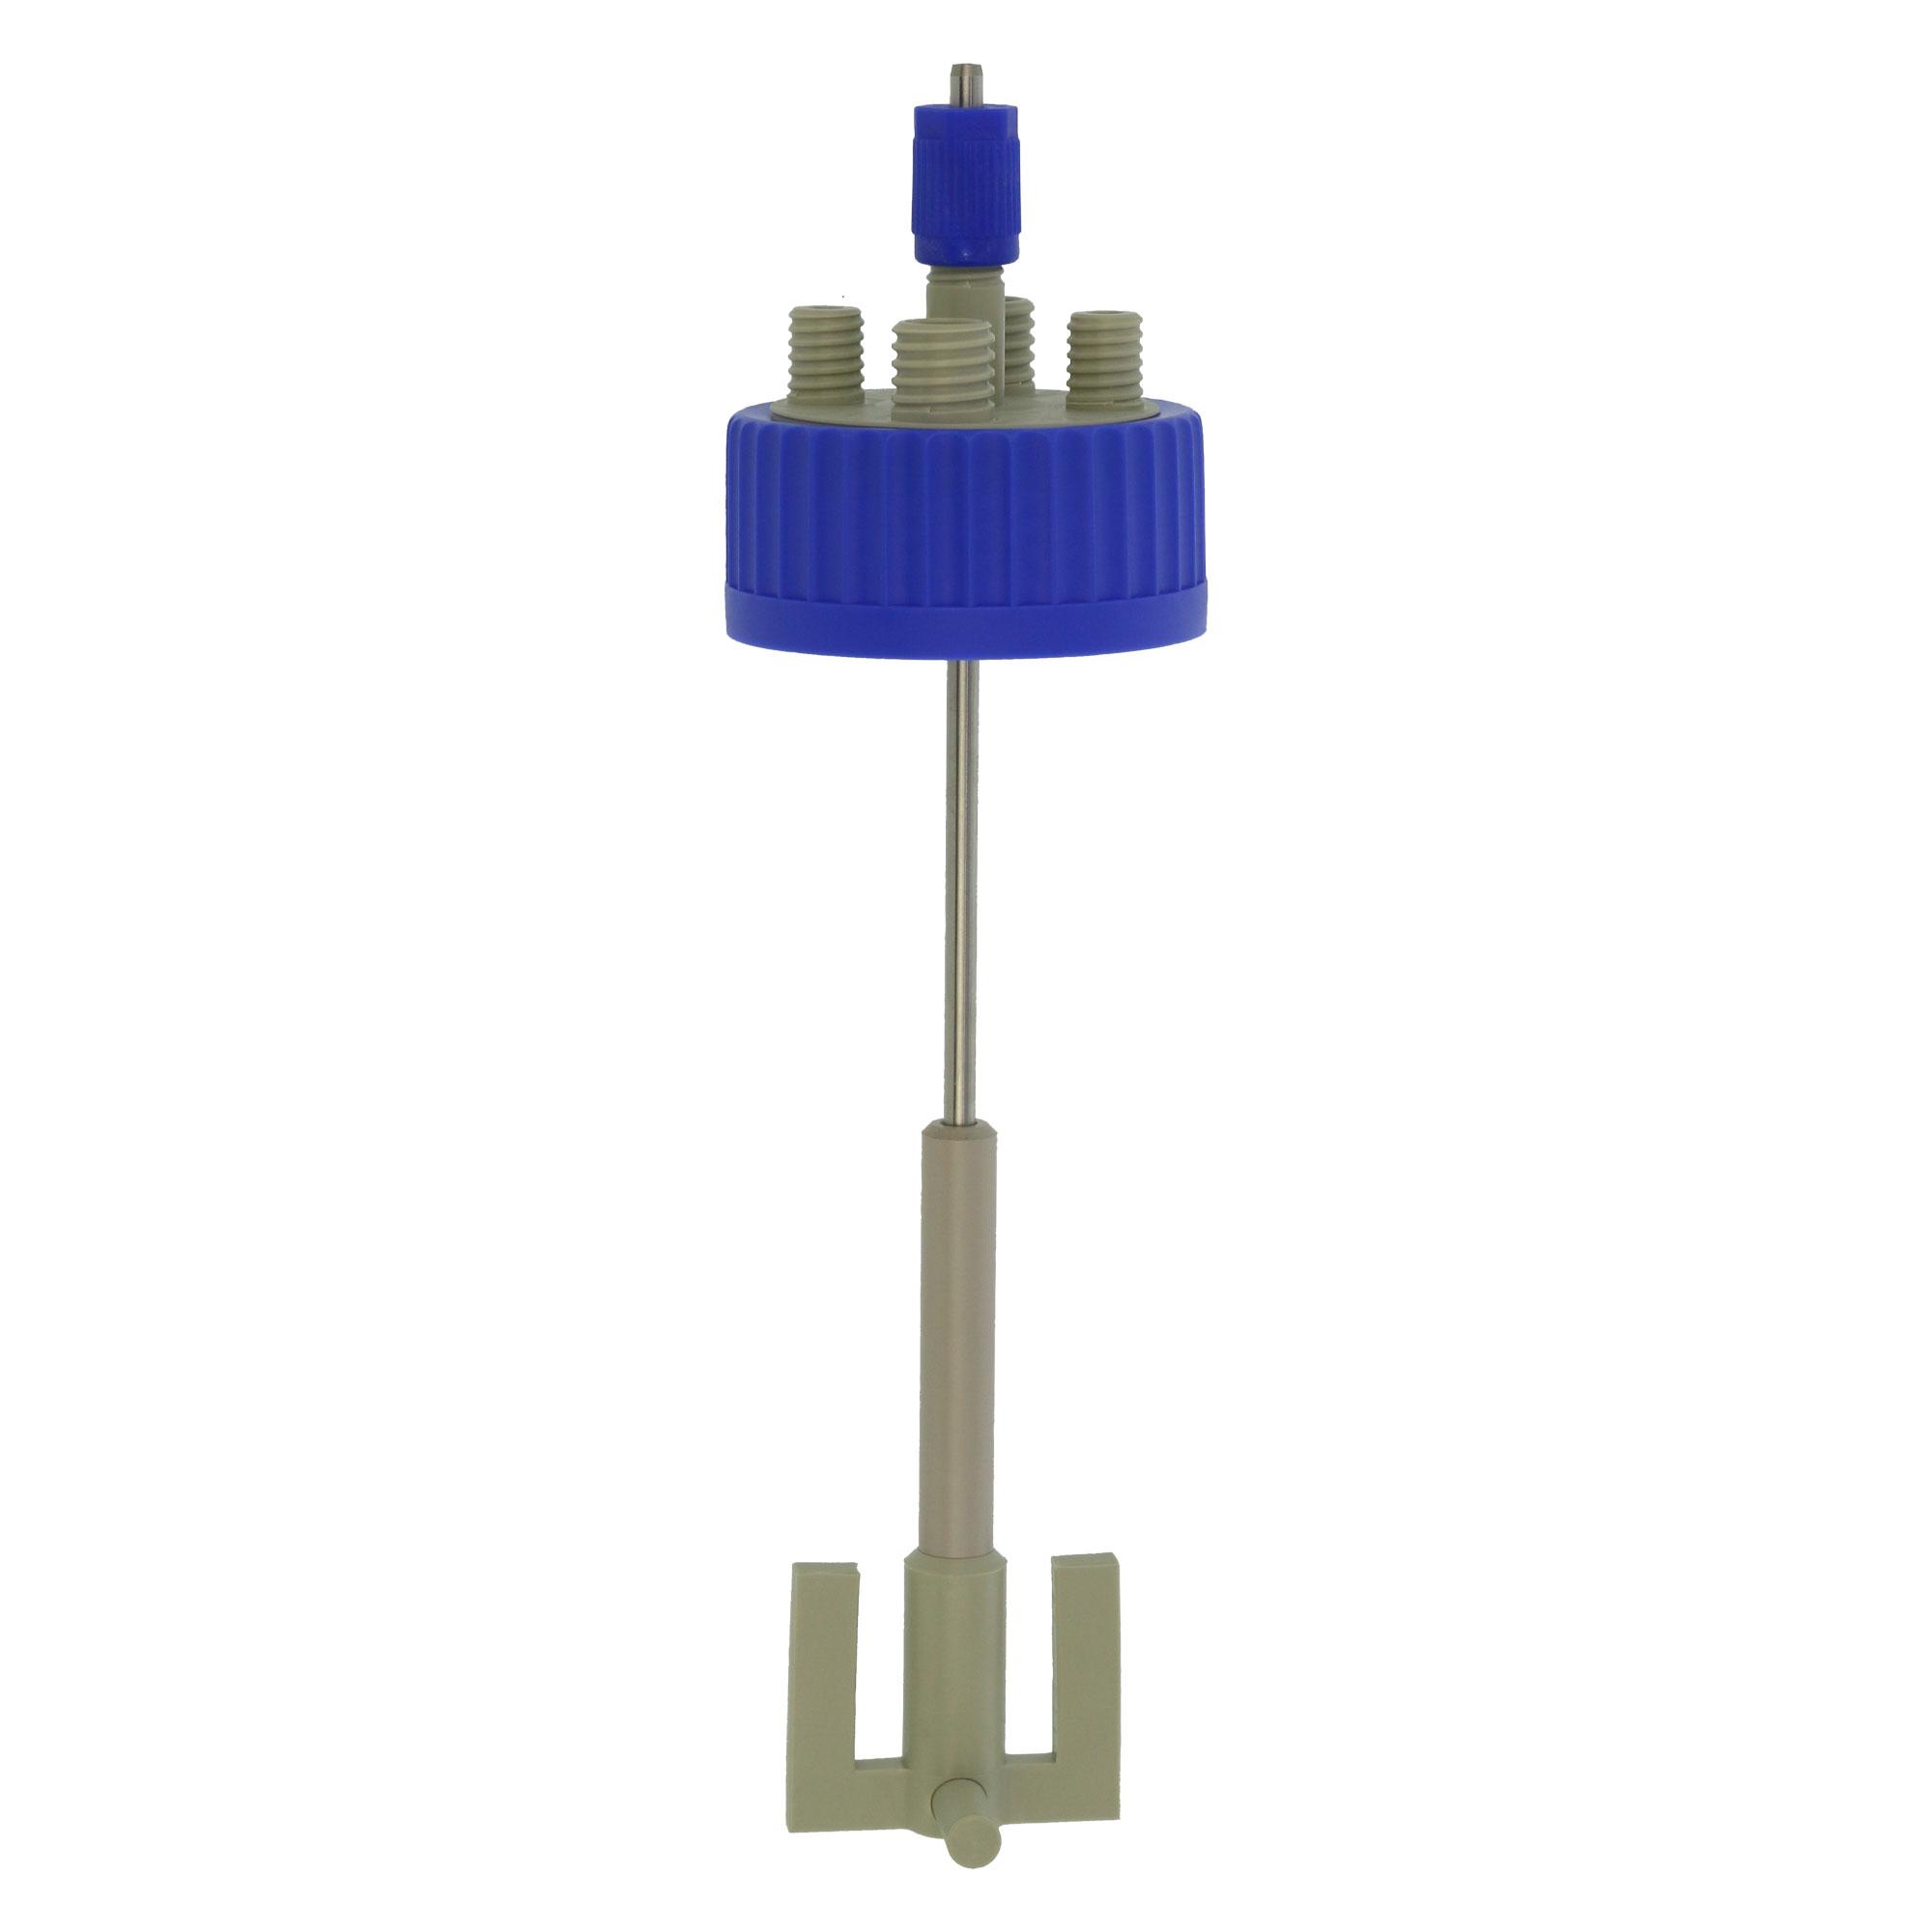 DURAN 撹拌反応容器用キャップセット(シャフト付き) GLS-80